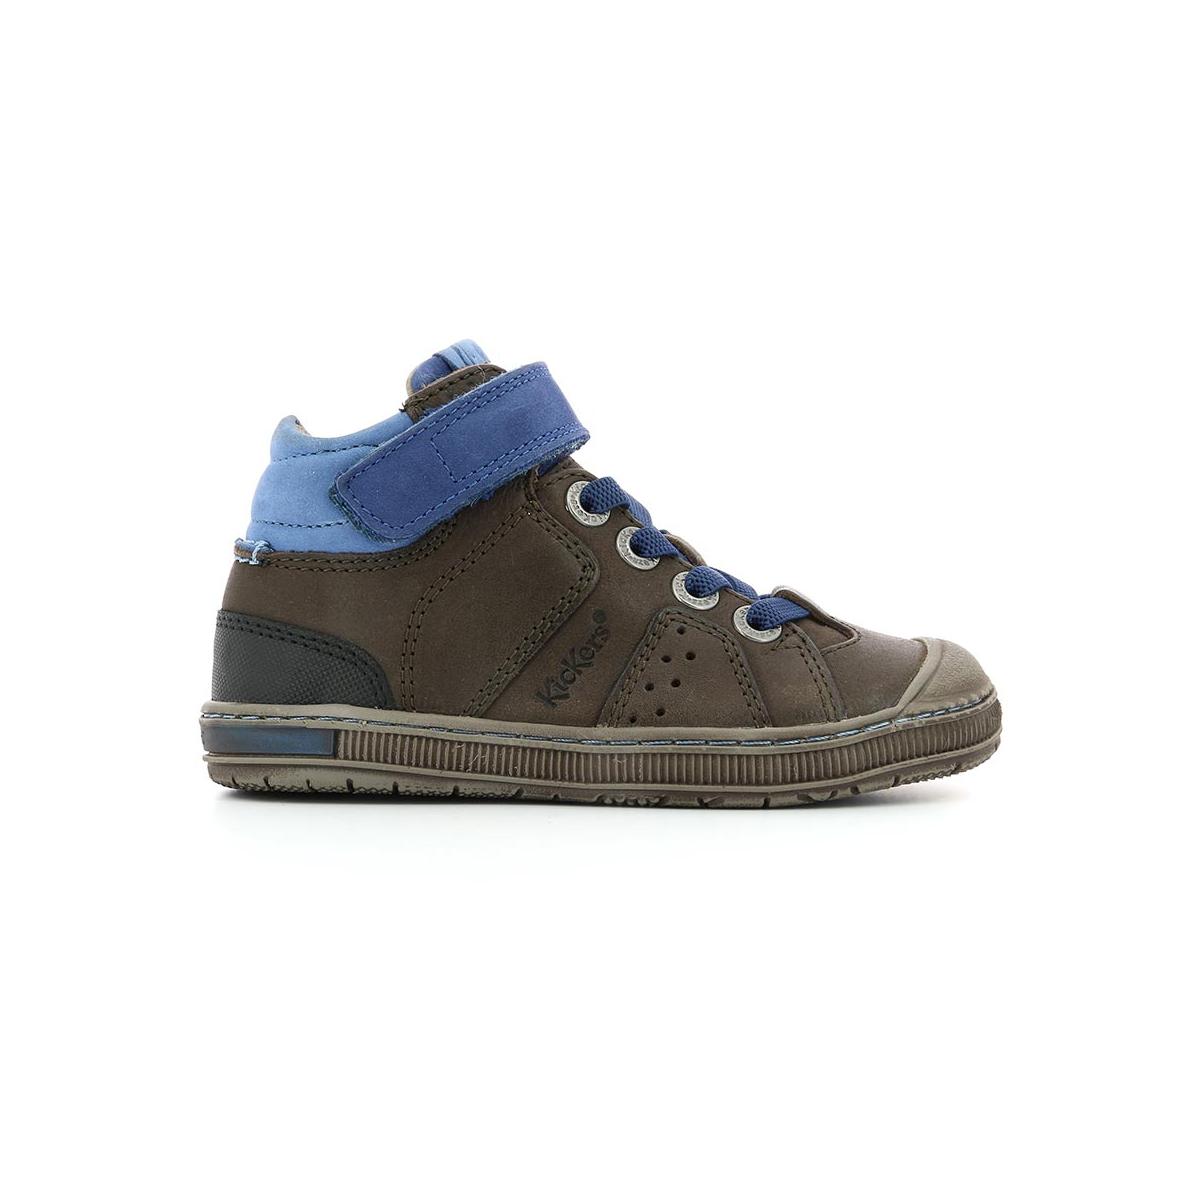 Iguane Chaussures Kickers Fonce Enfant Marron 4wzw7q